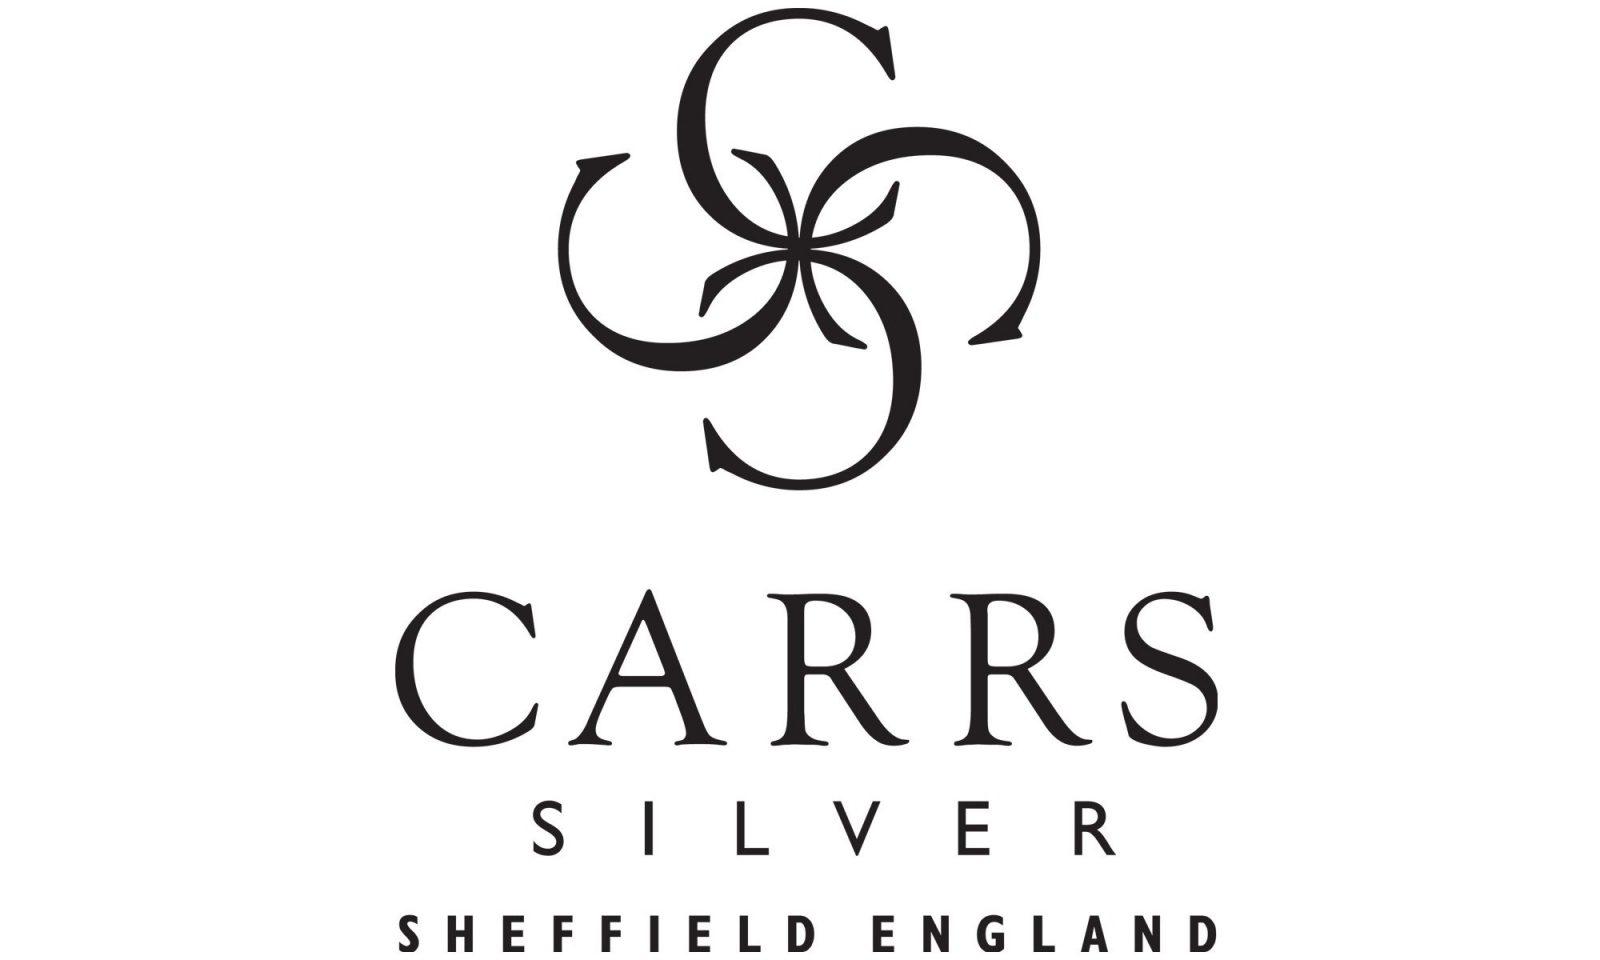 Carrs Silver Cutlery Sheffield England Logo